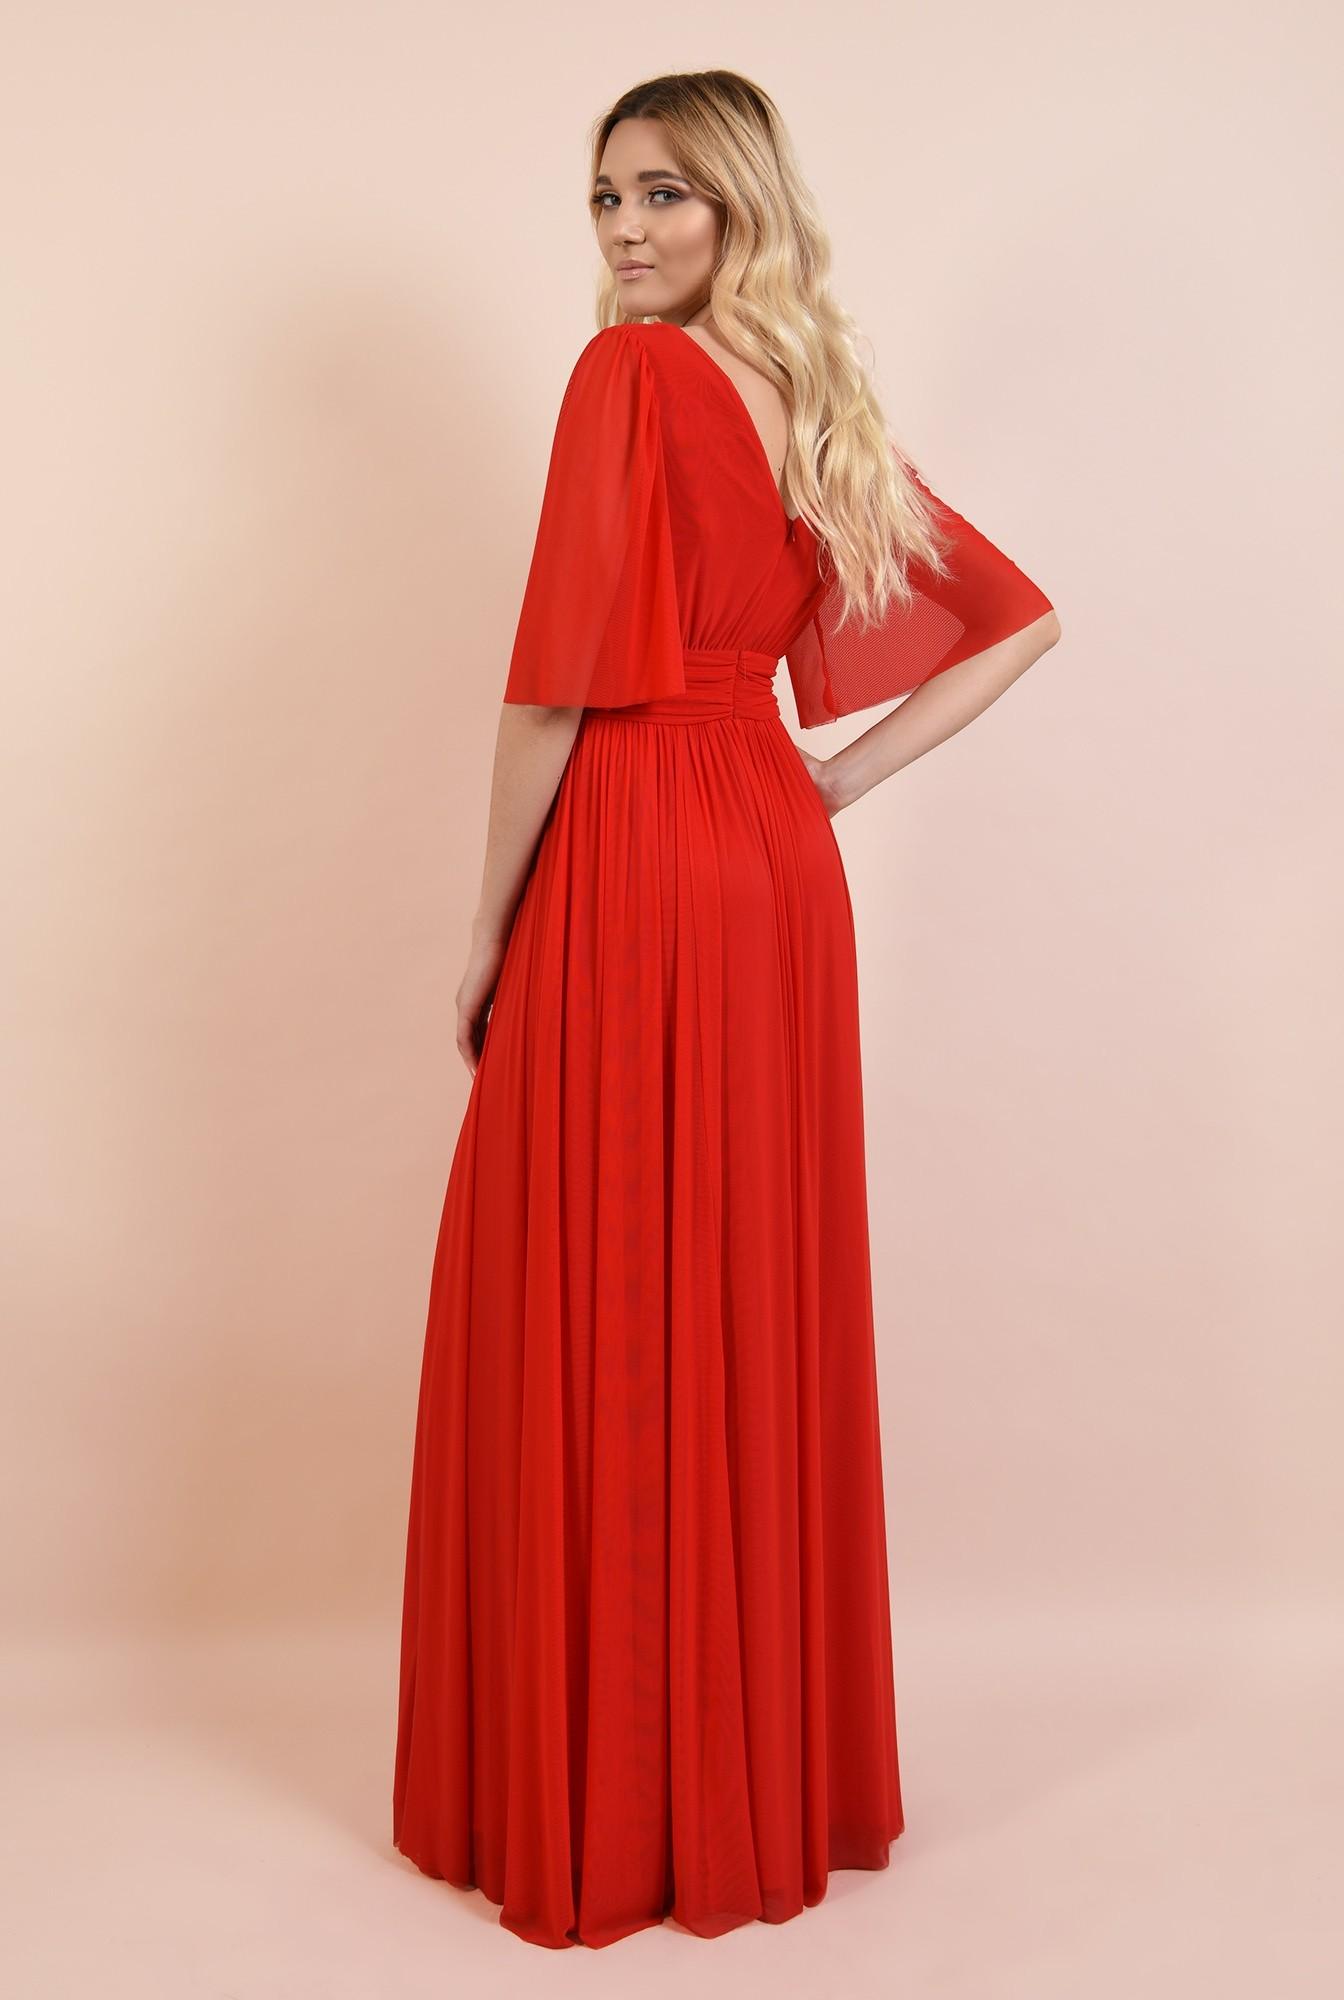 1 - rochie rosie, lunga, de seara, anchior, evazata, maneci fluture, Poema